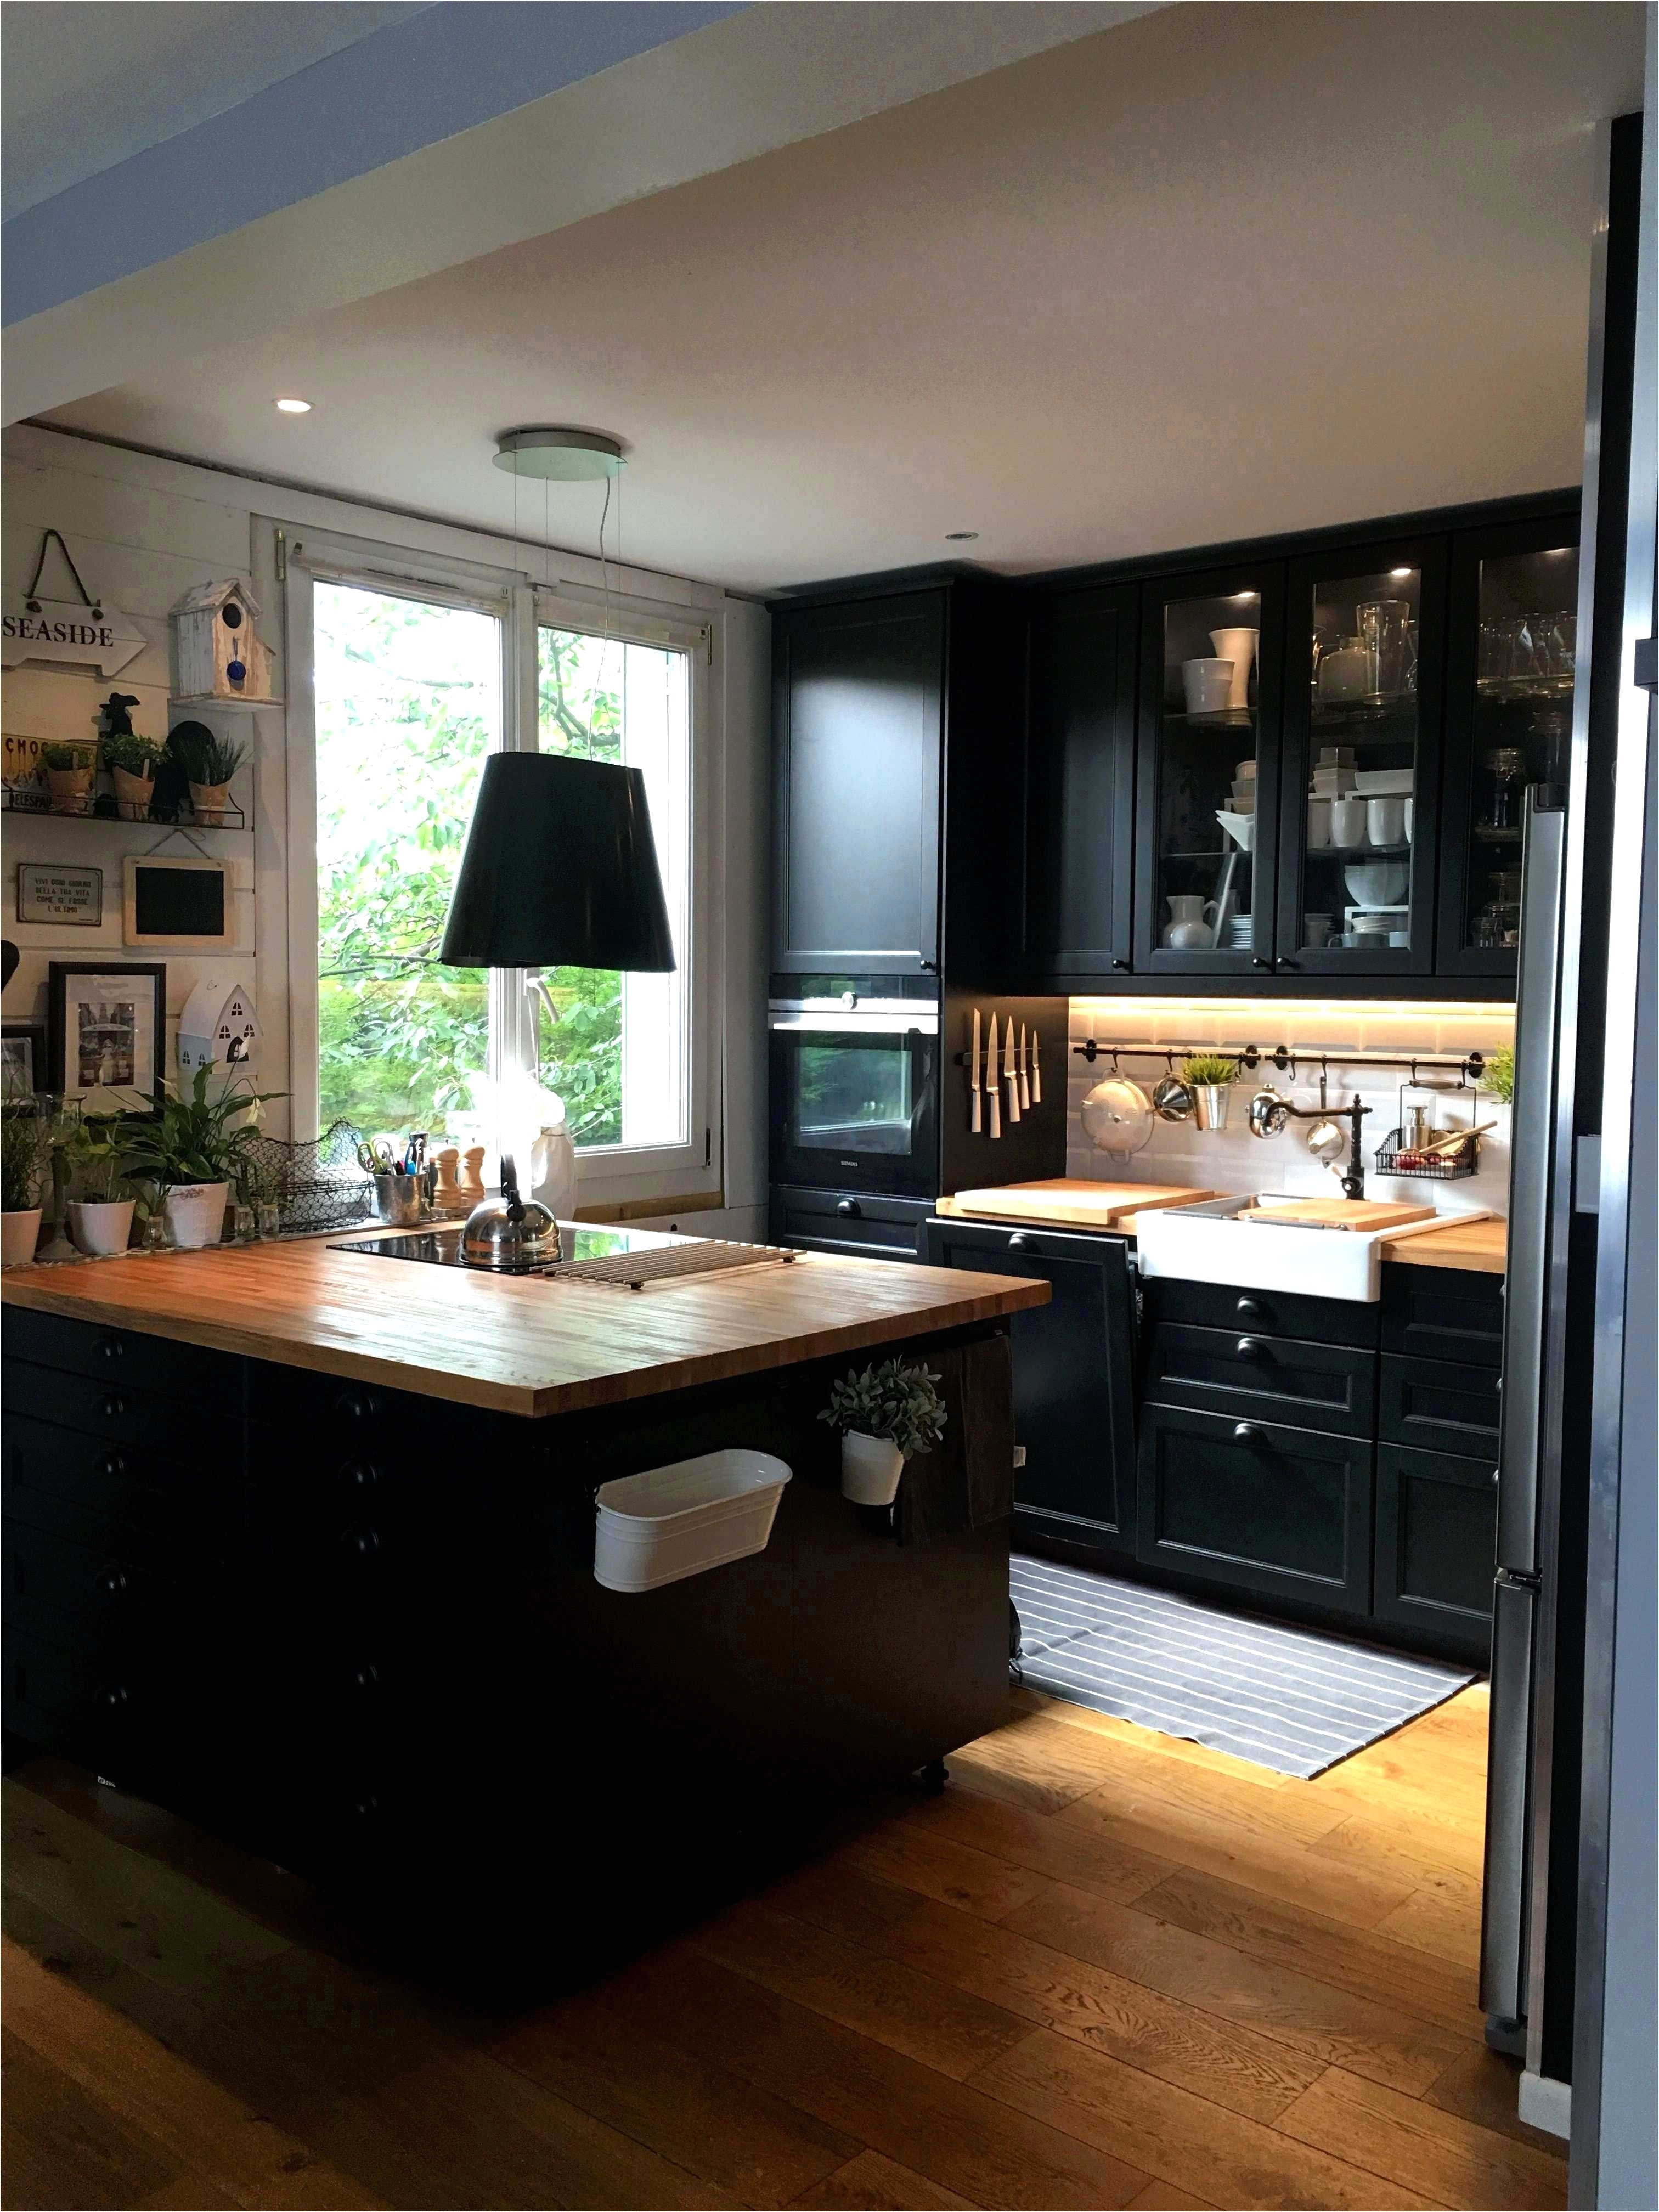 Magnificent Ikea Kitchen islands or Kitchen island Design Plans Awesome Kitchen L Kitchen L Kitchen 0d